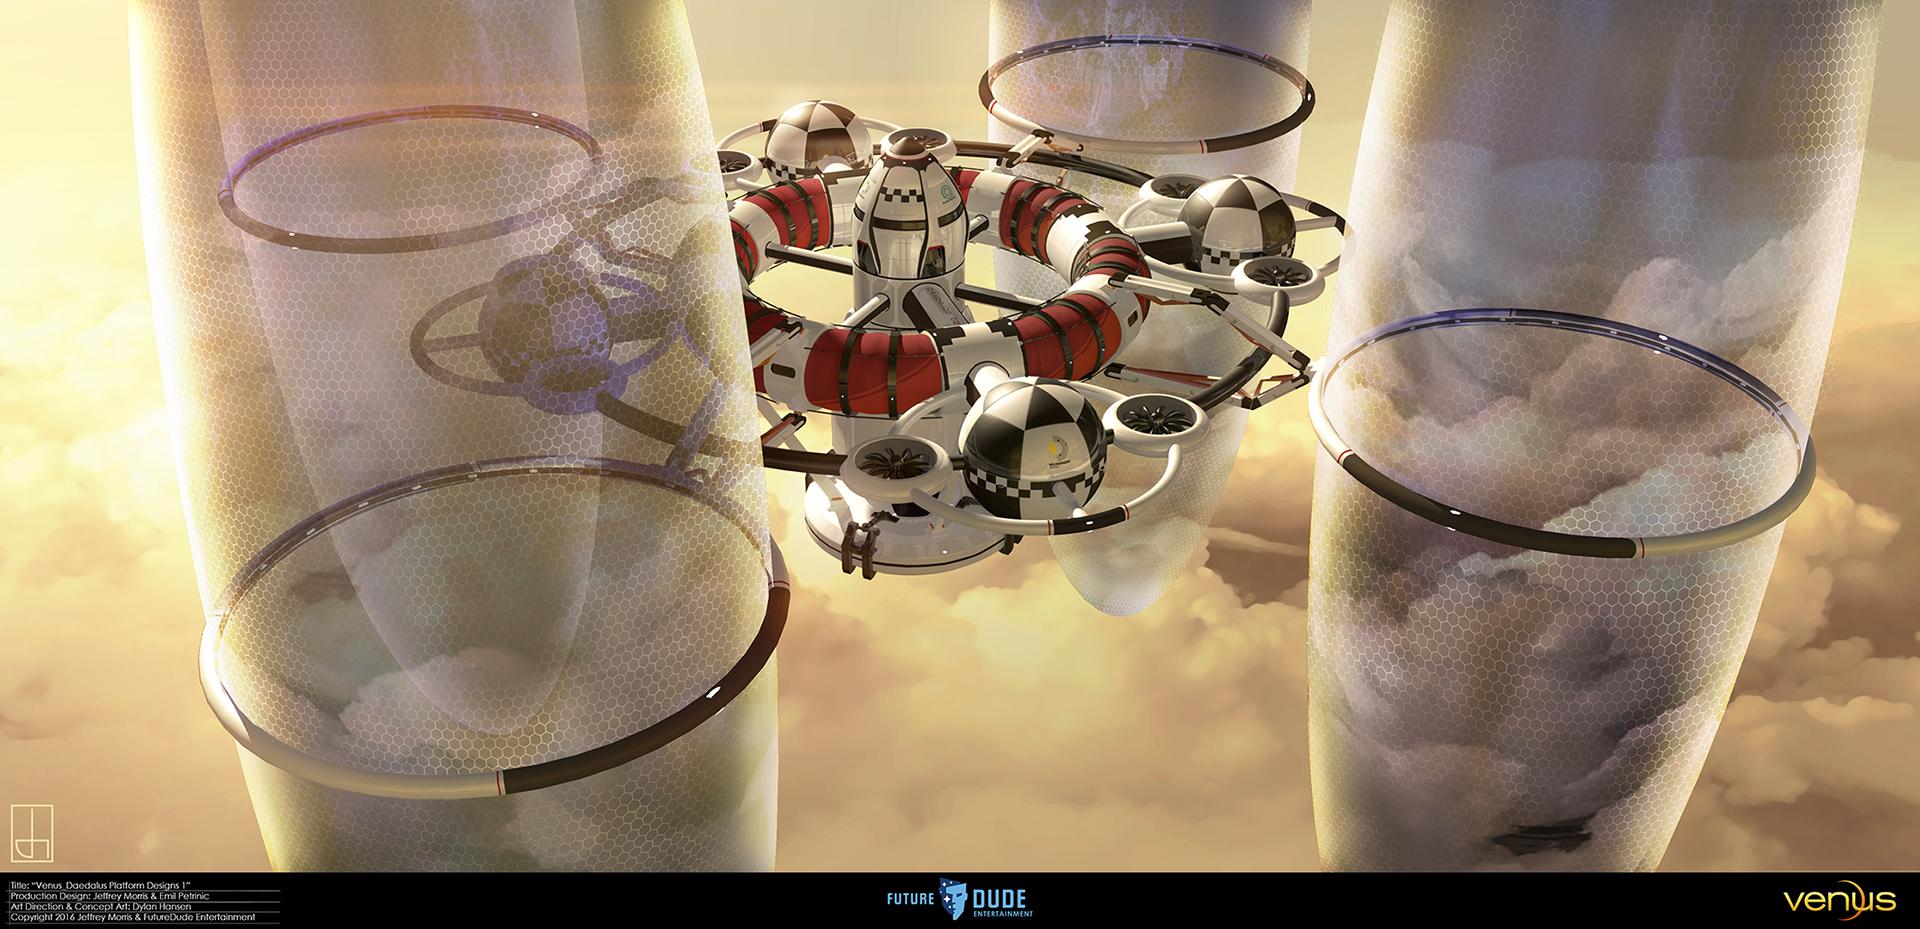 Venus Spaceship Design 1.jpg